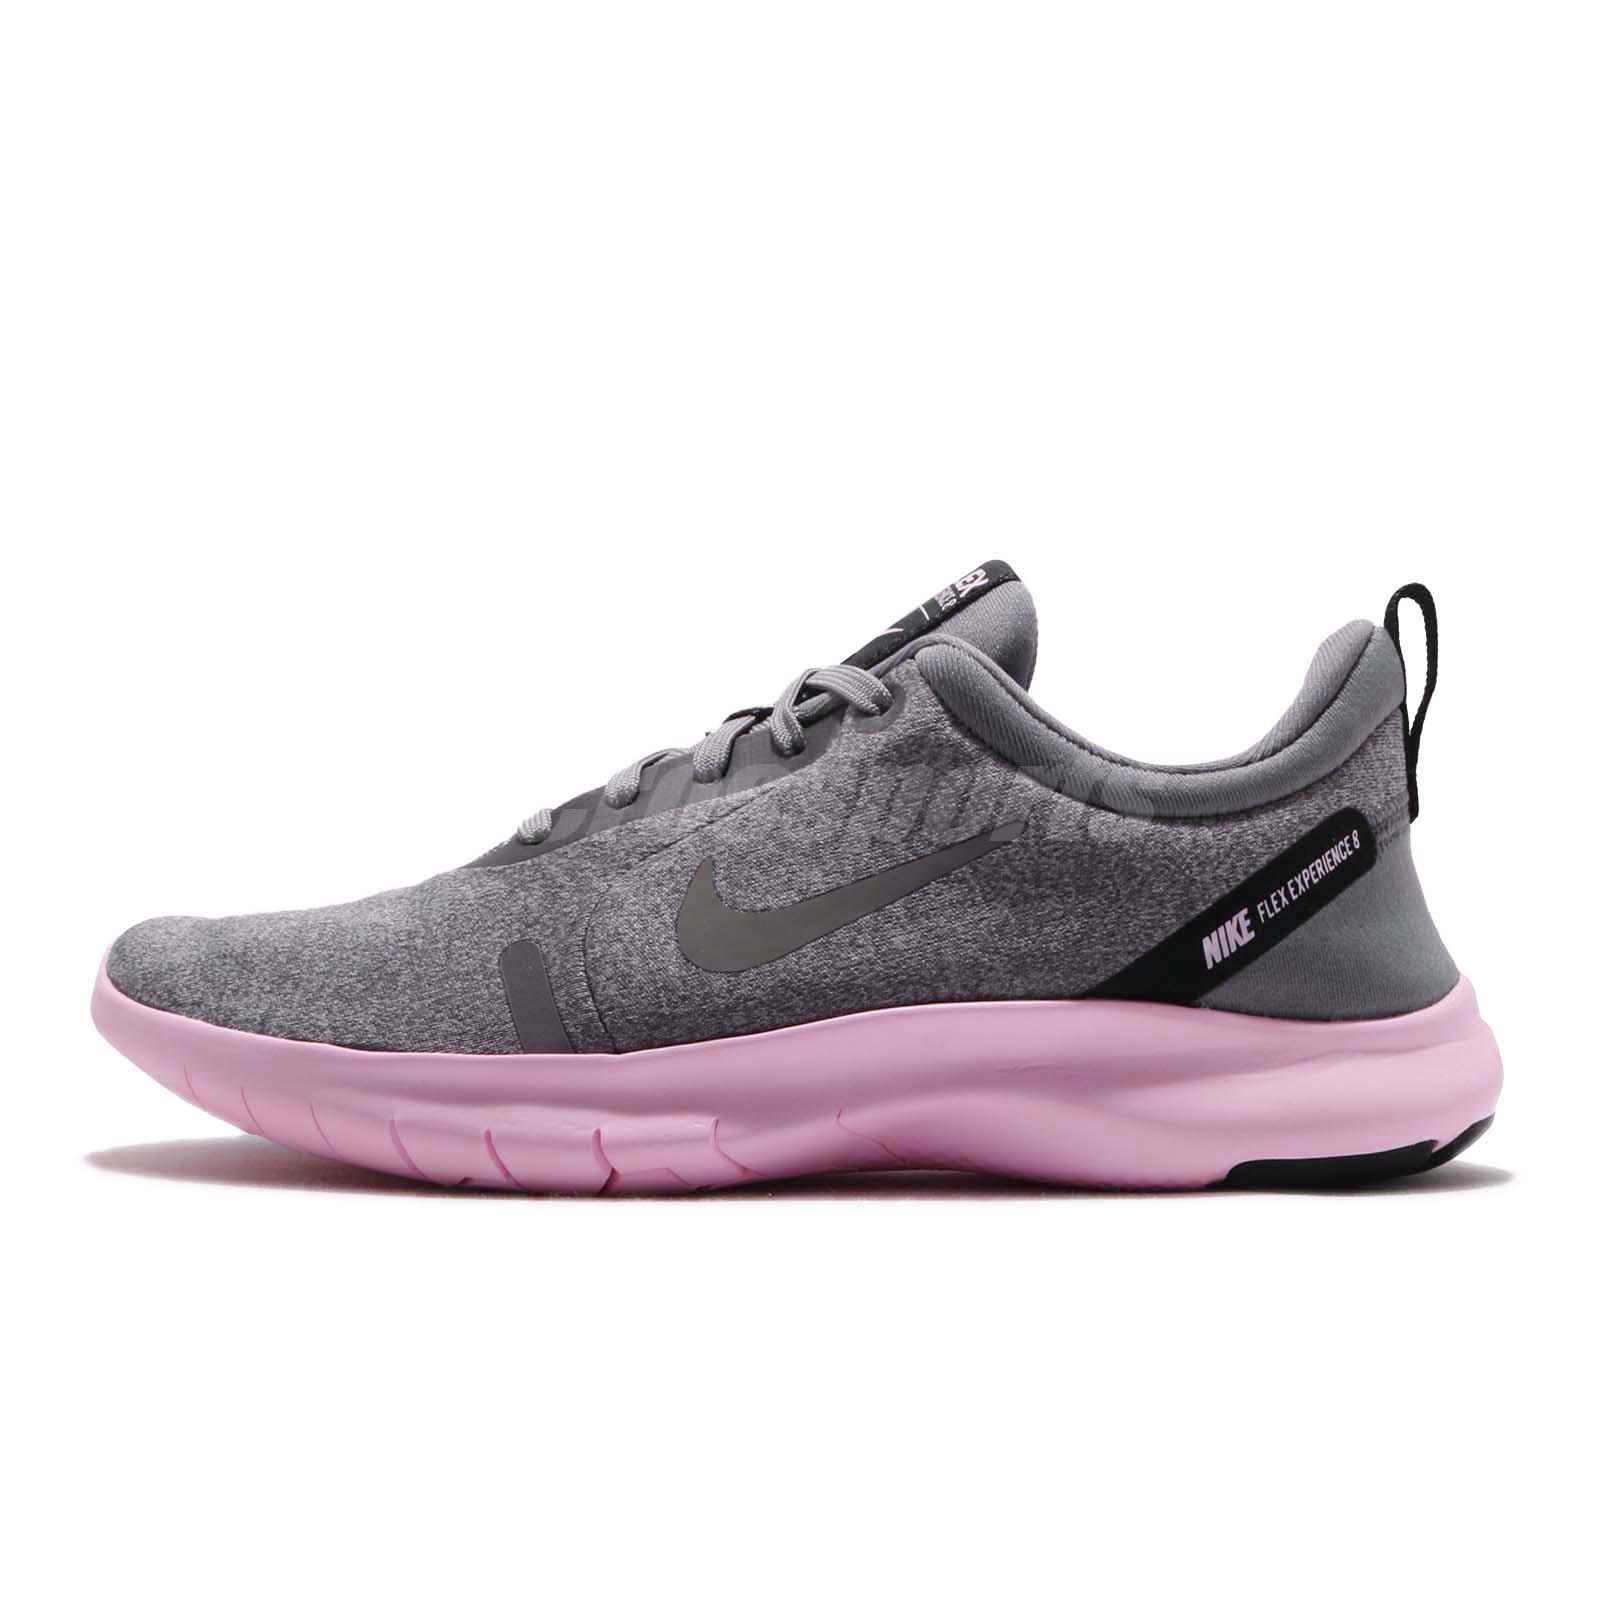 nike flex experience rn 8 women's running shoe